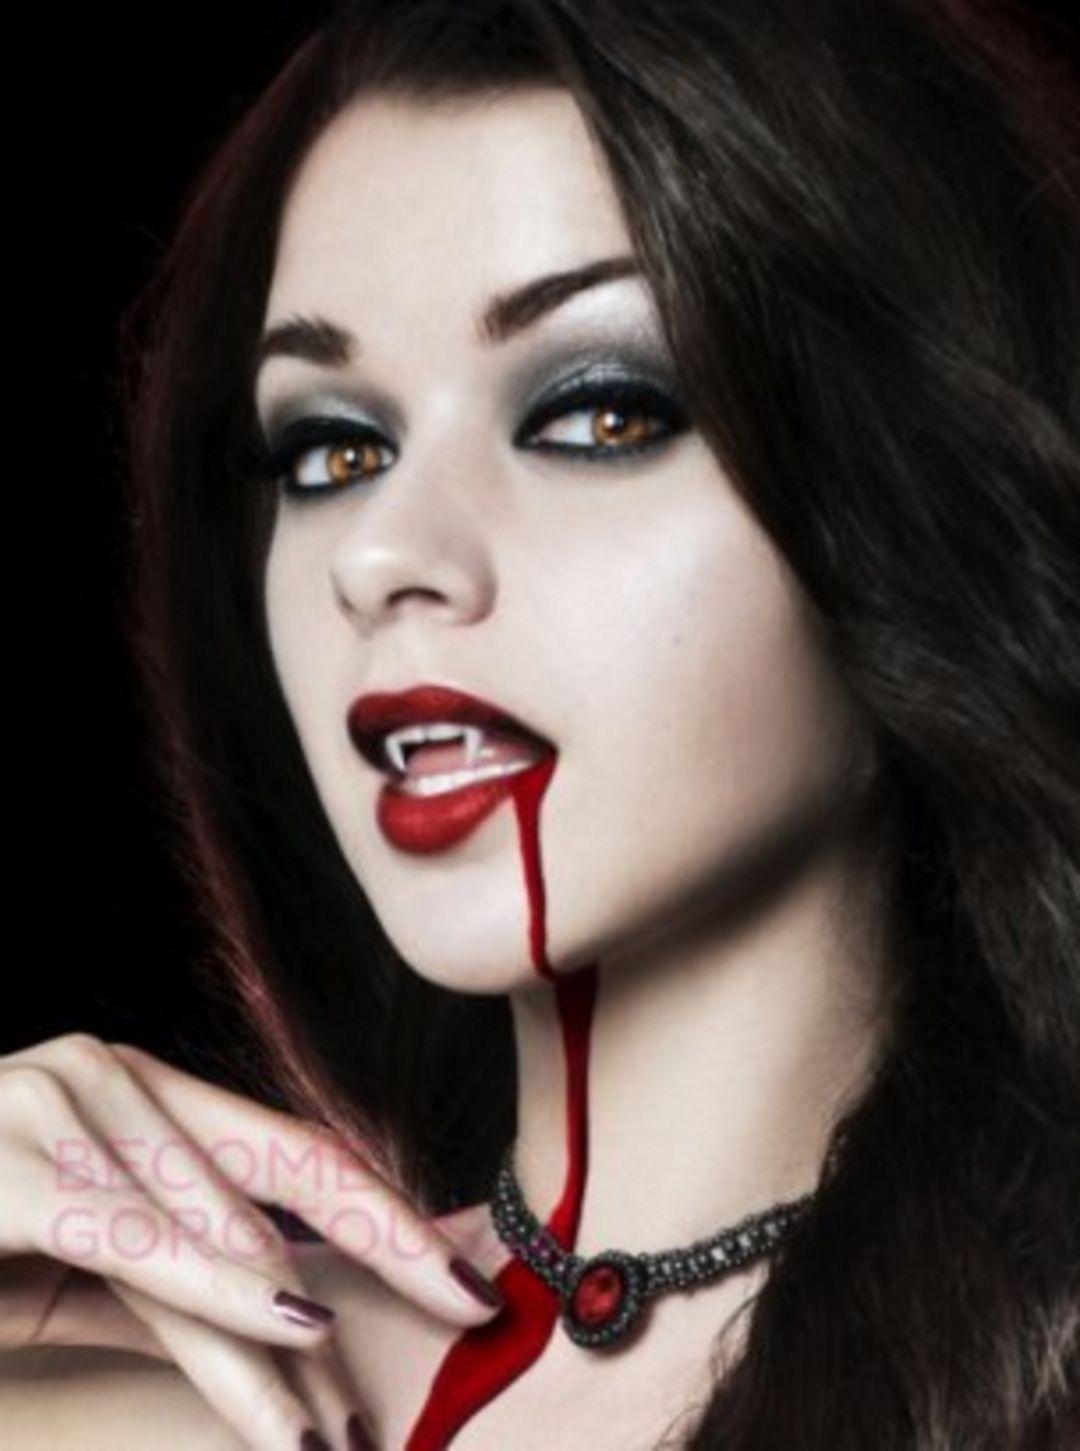 See through nose piercing   Best Vampire Makeup Idea For Halloween party  Vampire makeup